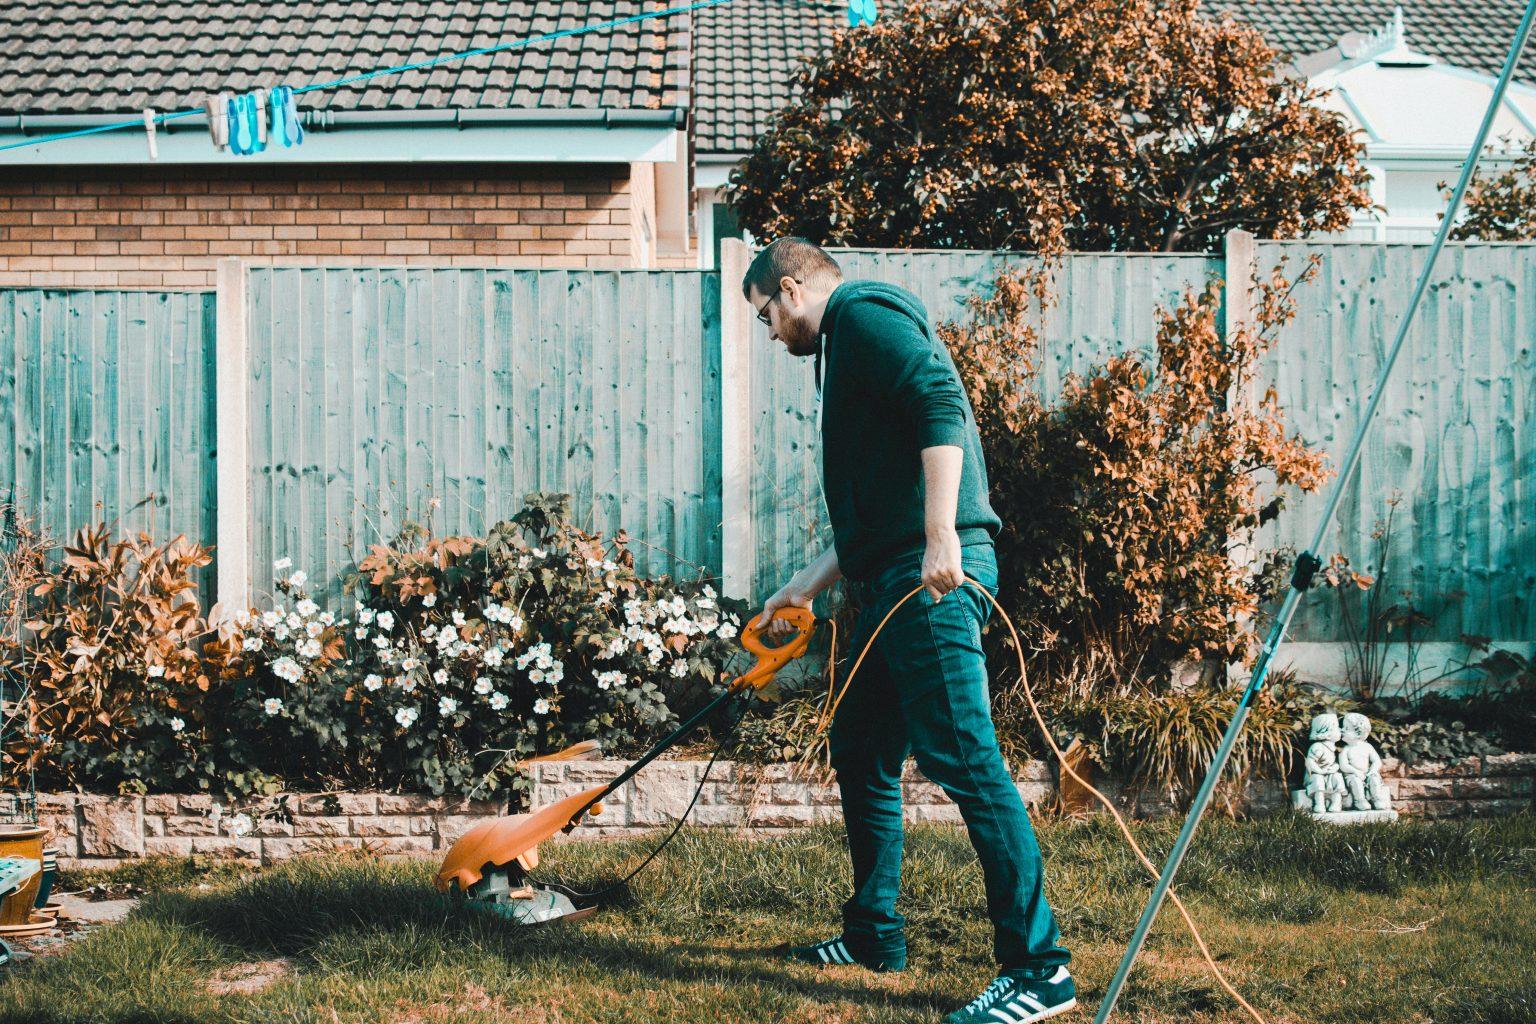 man mowing lawn in garden